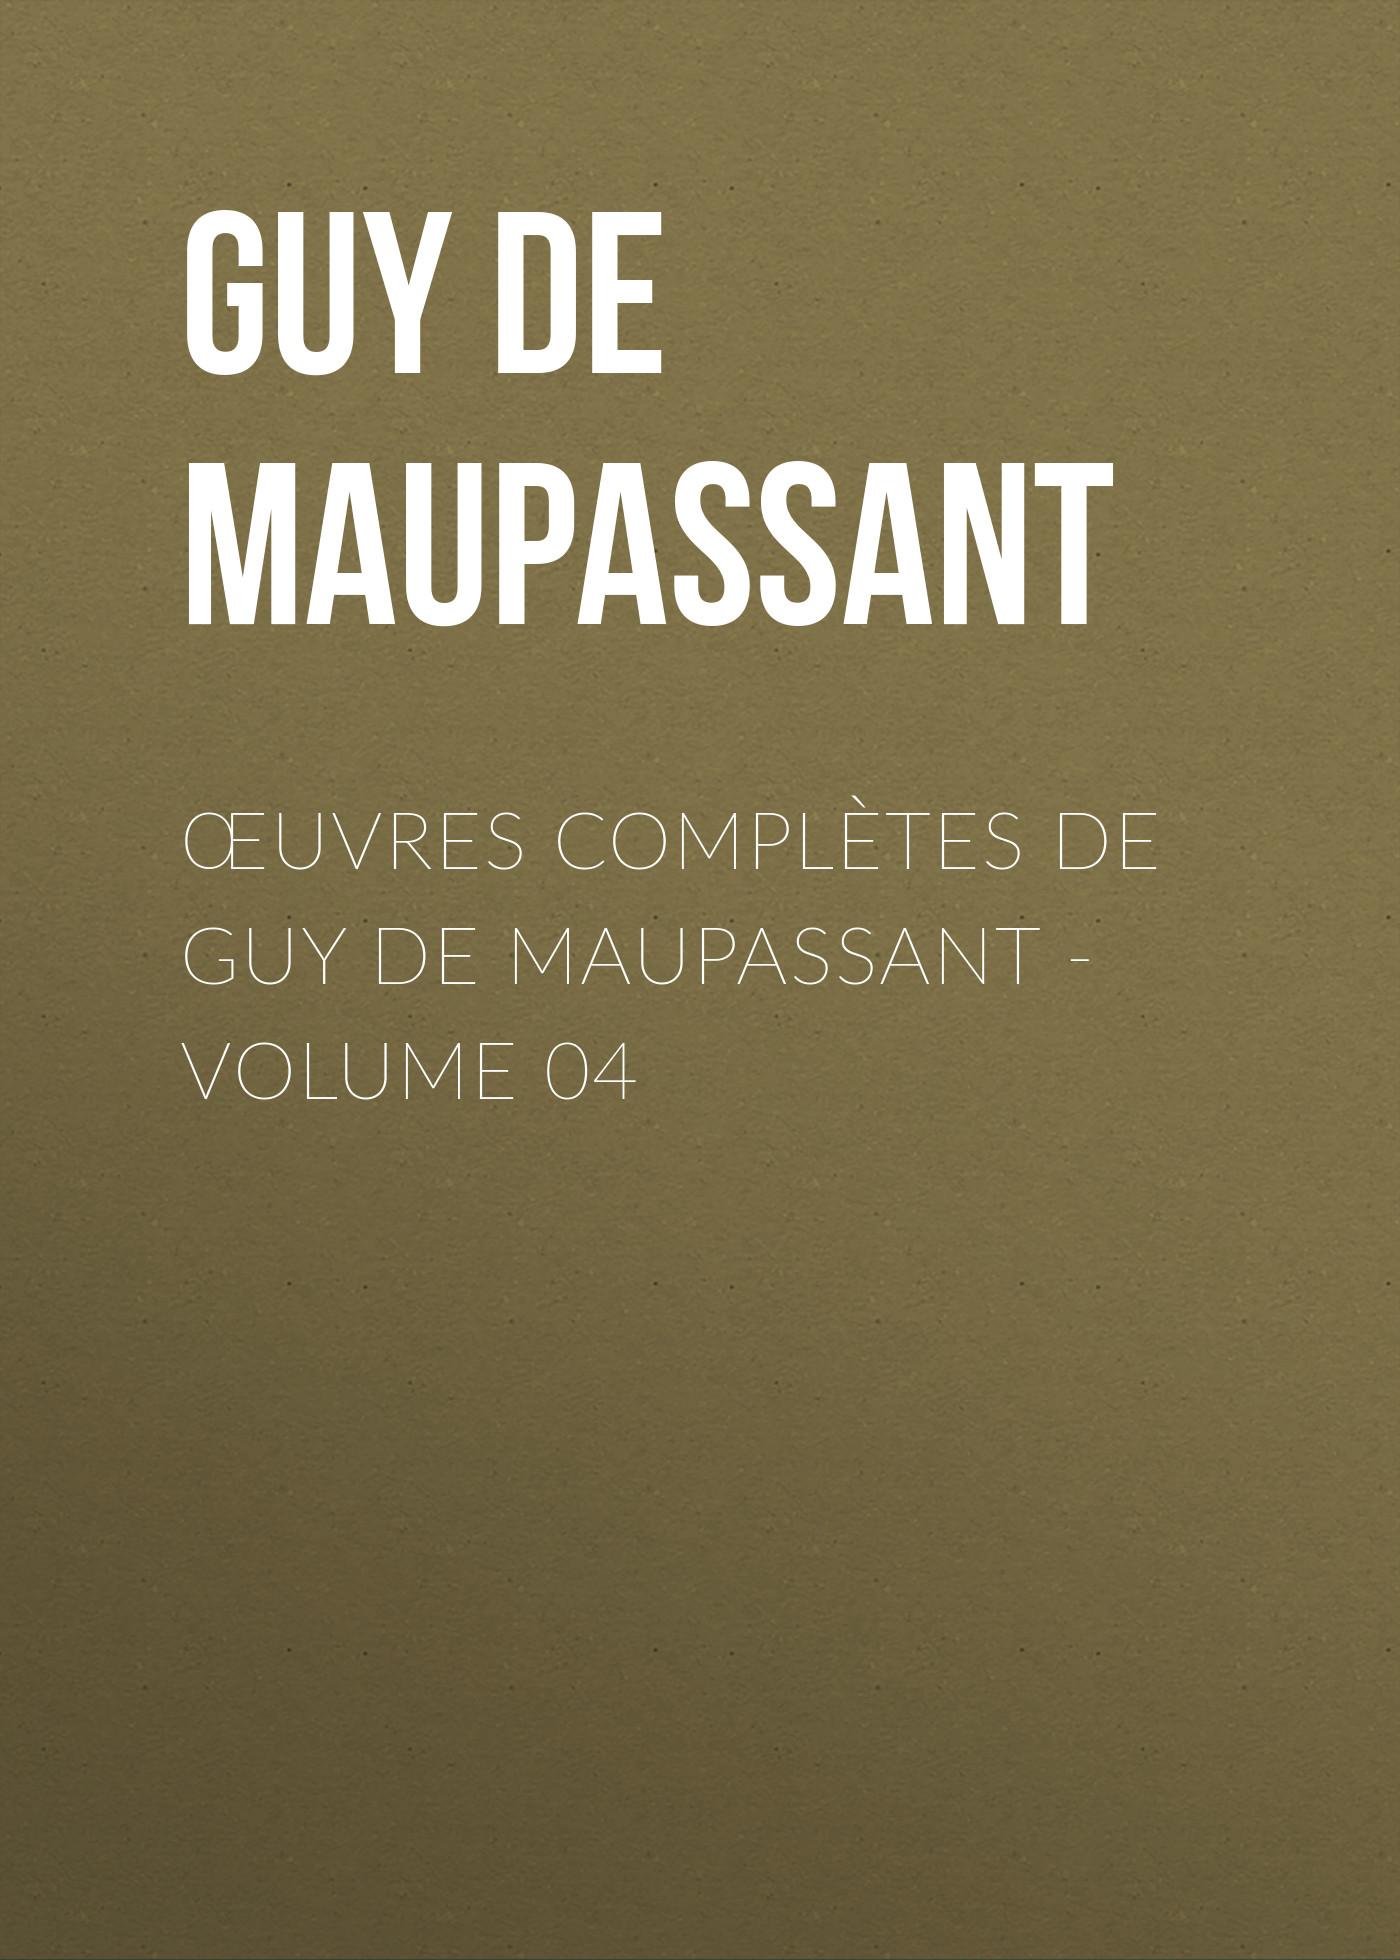 Ги де Мопассан Œuvres complètes de Guy de Maupassant - volume 04 ги де мопассан œuvres complètes de guy de maupassant volume 03